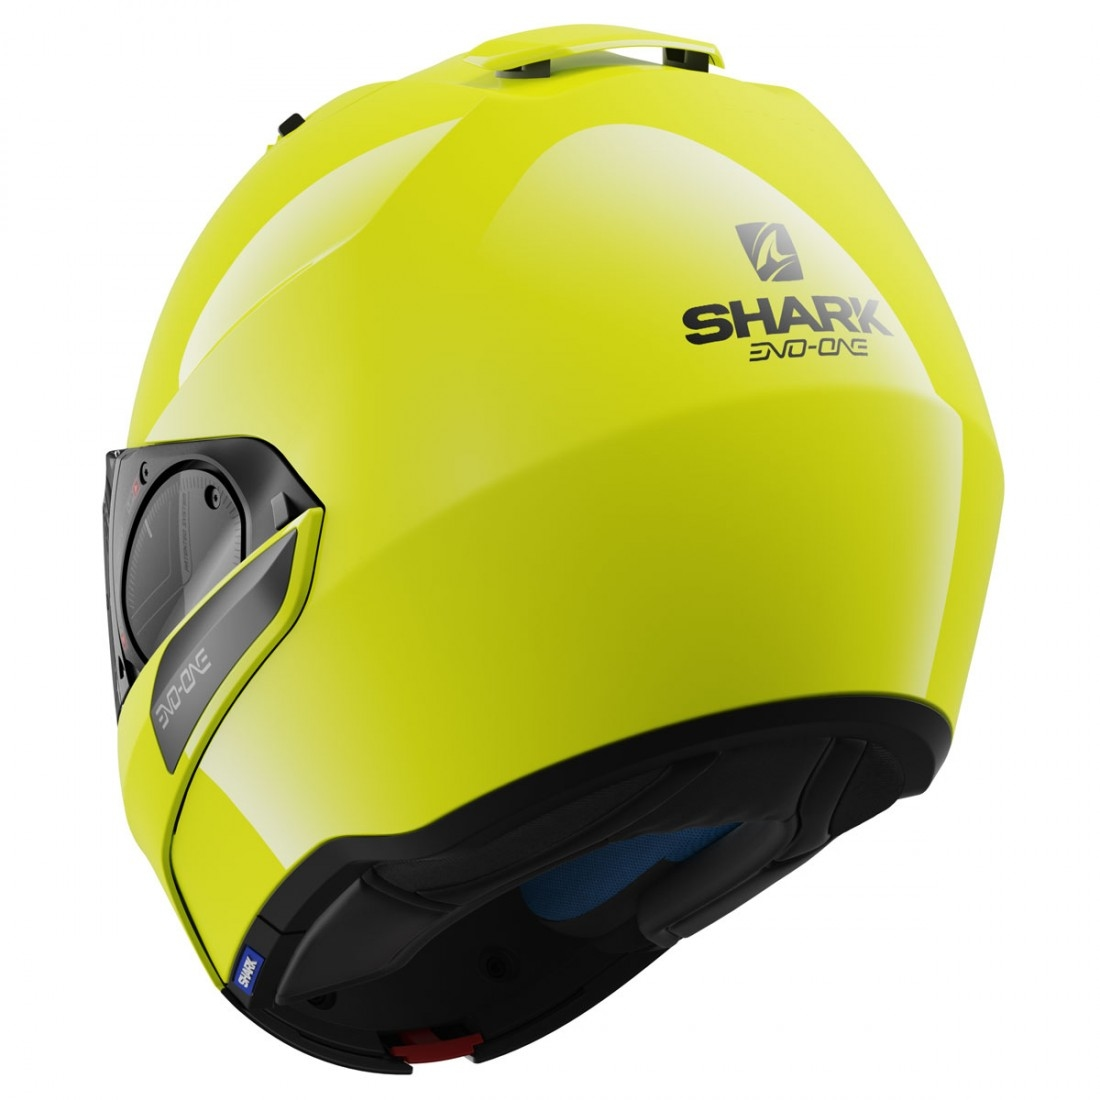 shark evo one 2 hi vis yellow black yellow helmet. Black Bedroom Furniture Sets. Home Design Ideas